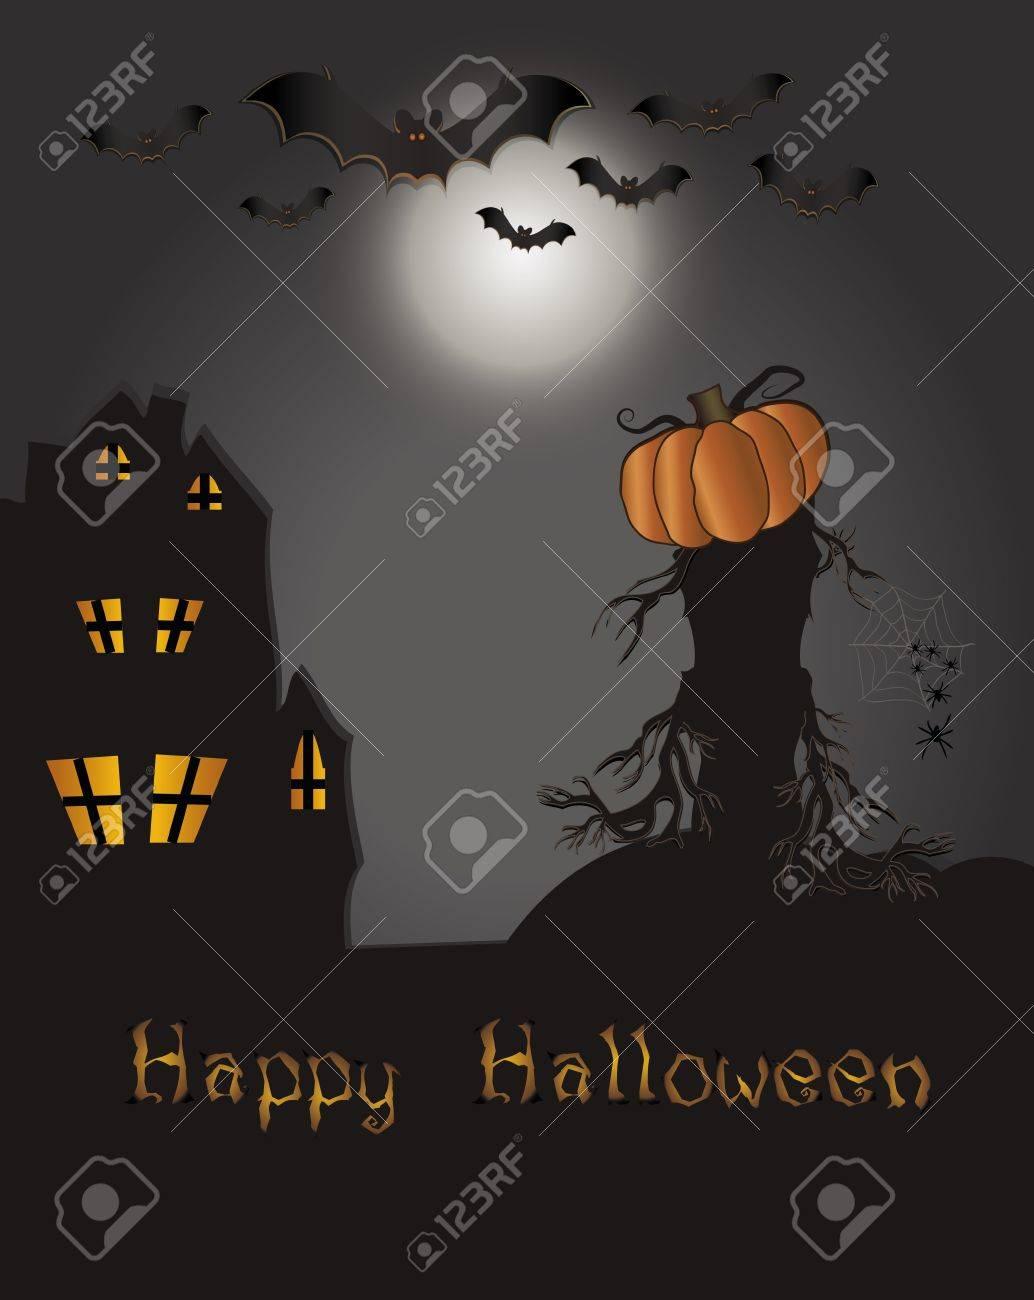 Halloween Happy card - bat pumpkin spider web house tree Stock Vector - 10292052